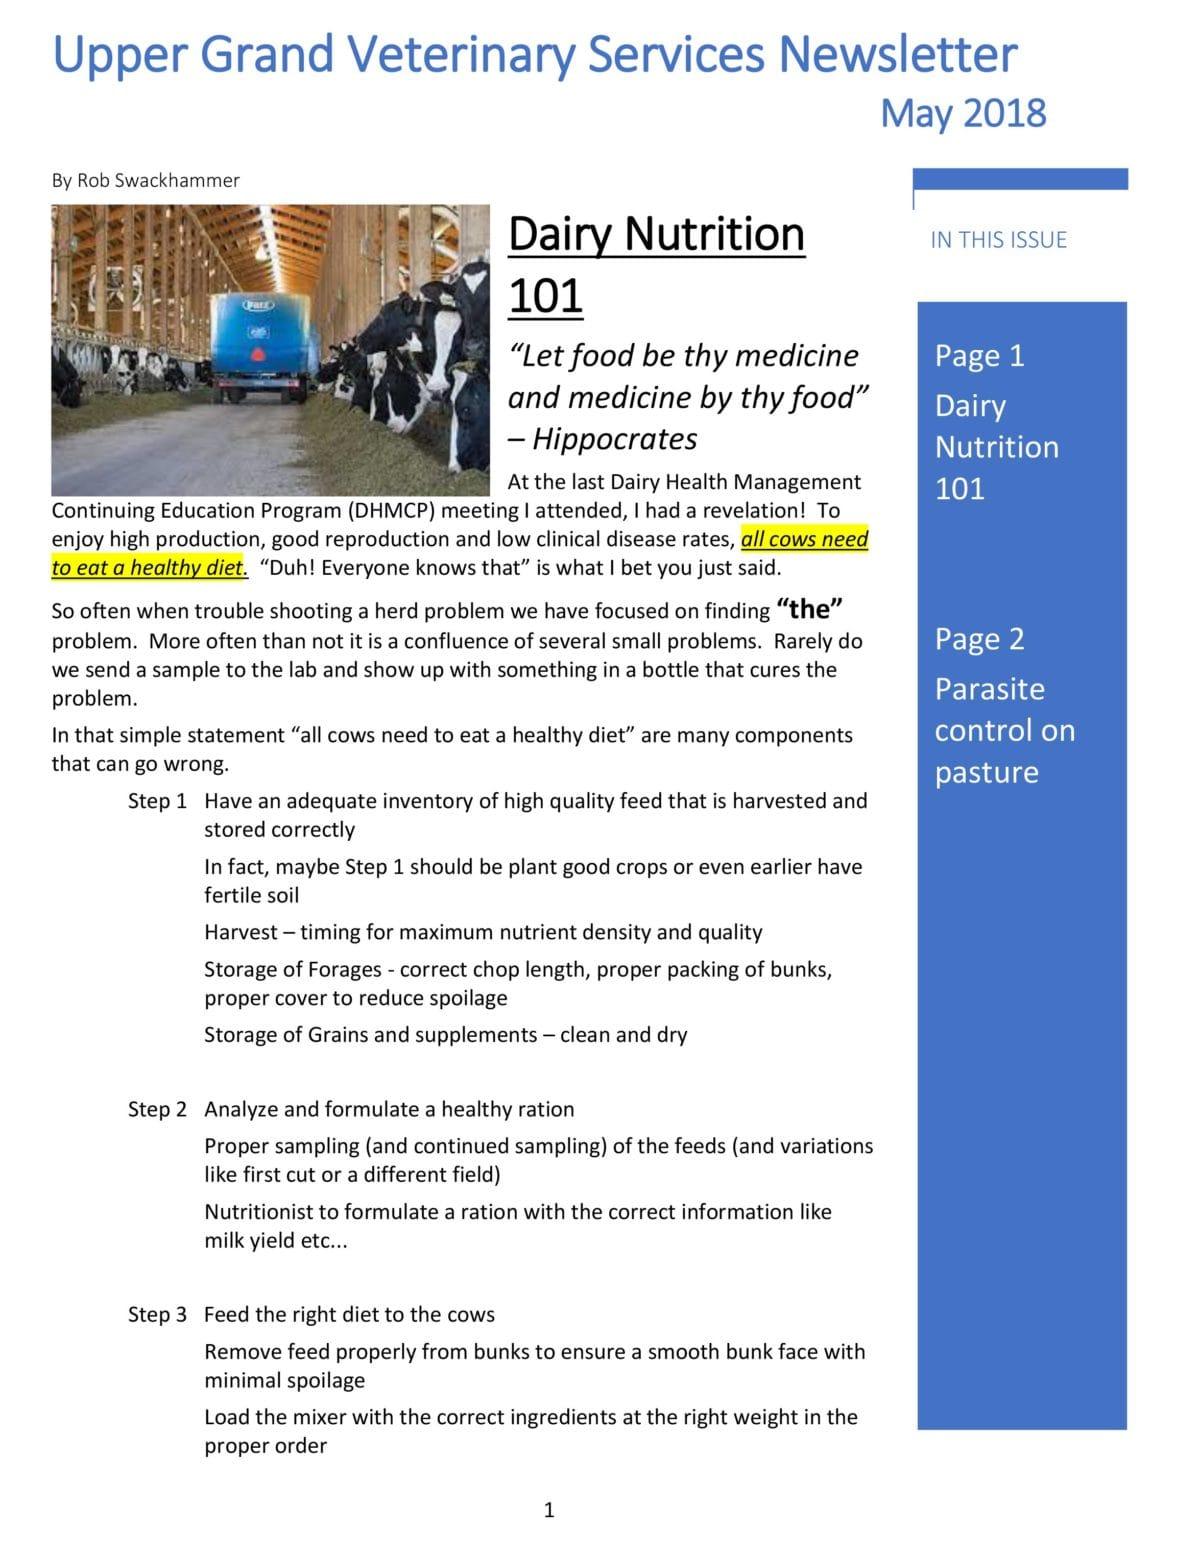 UGVS-May-2018-Newsletter-1-copy-1200x1558.jpg